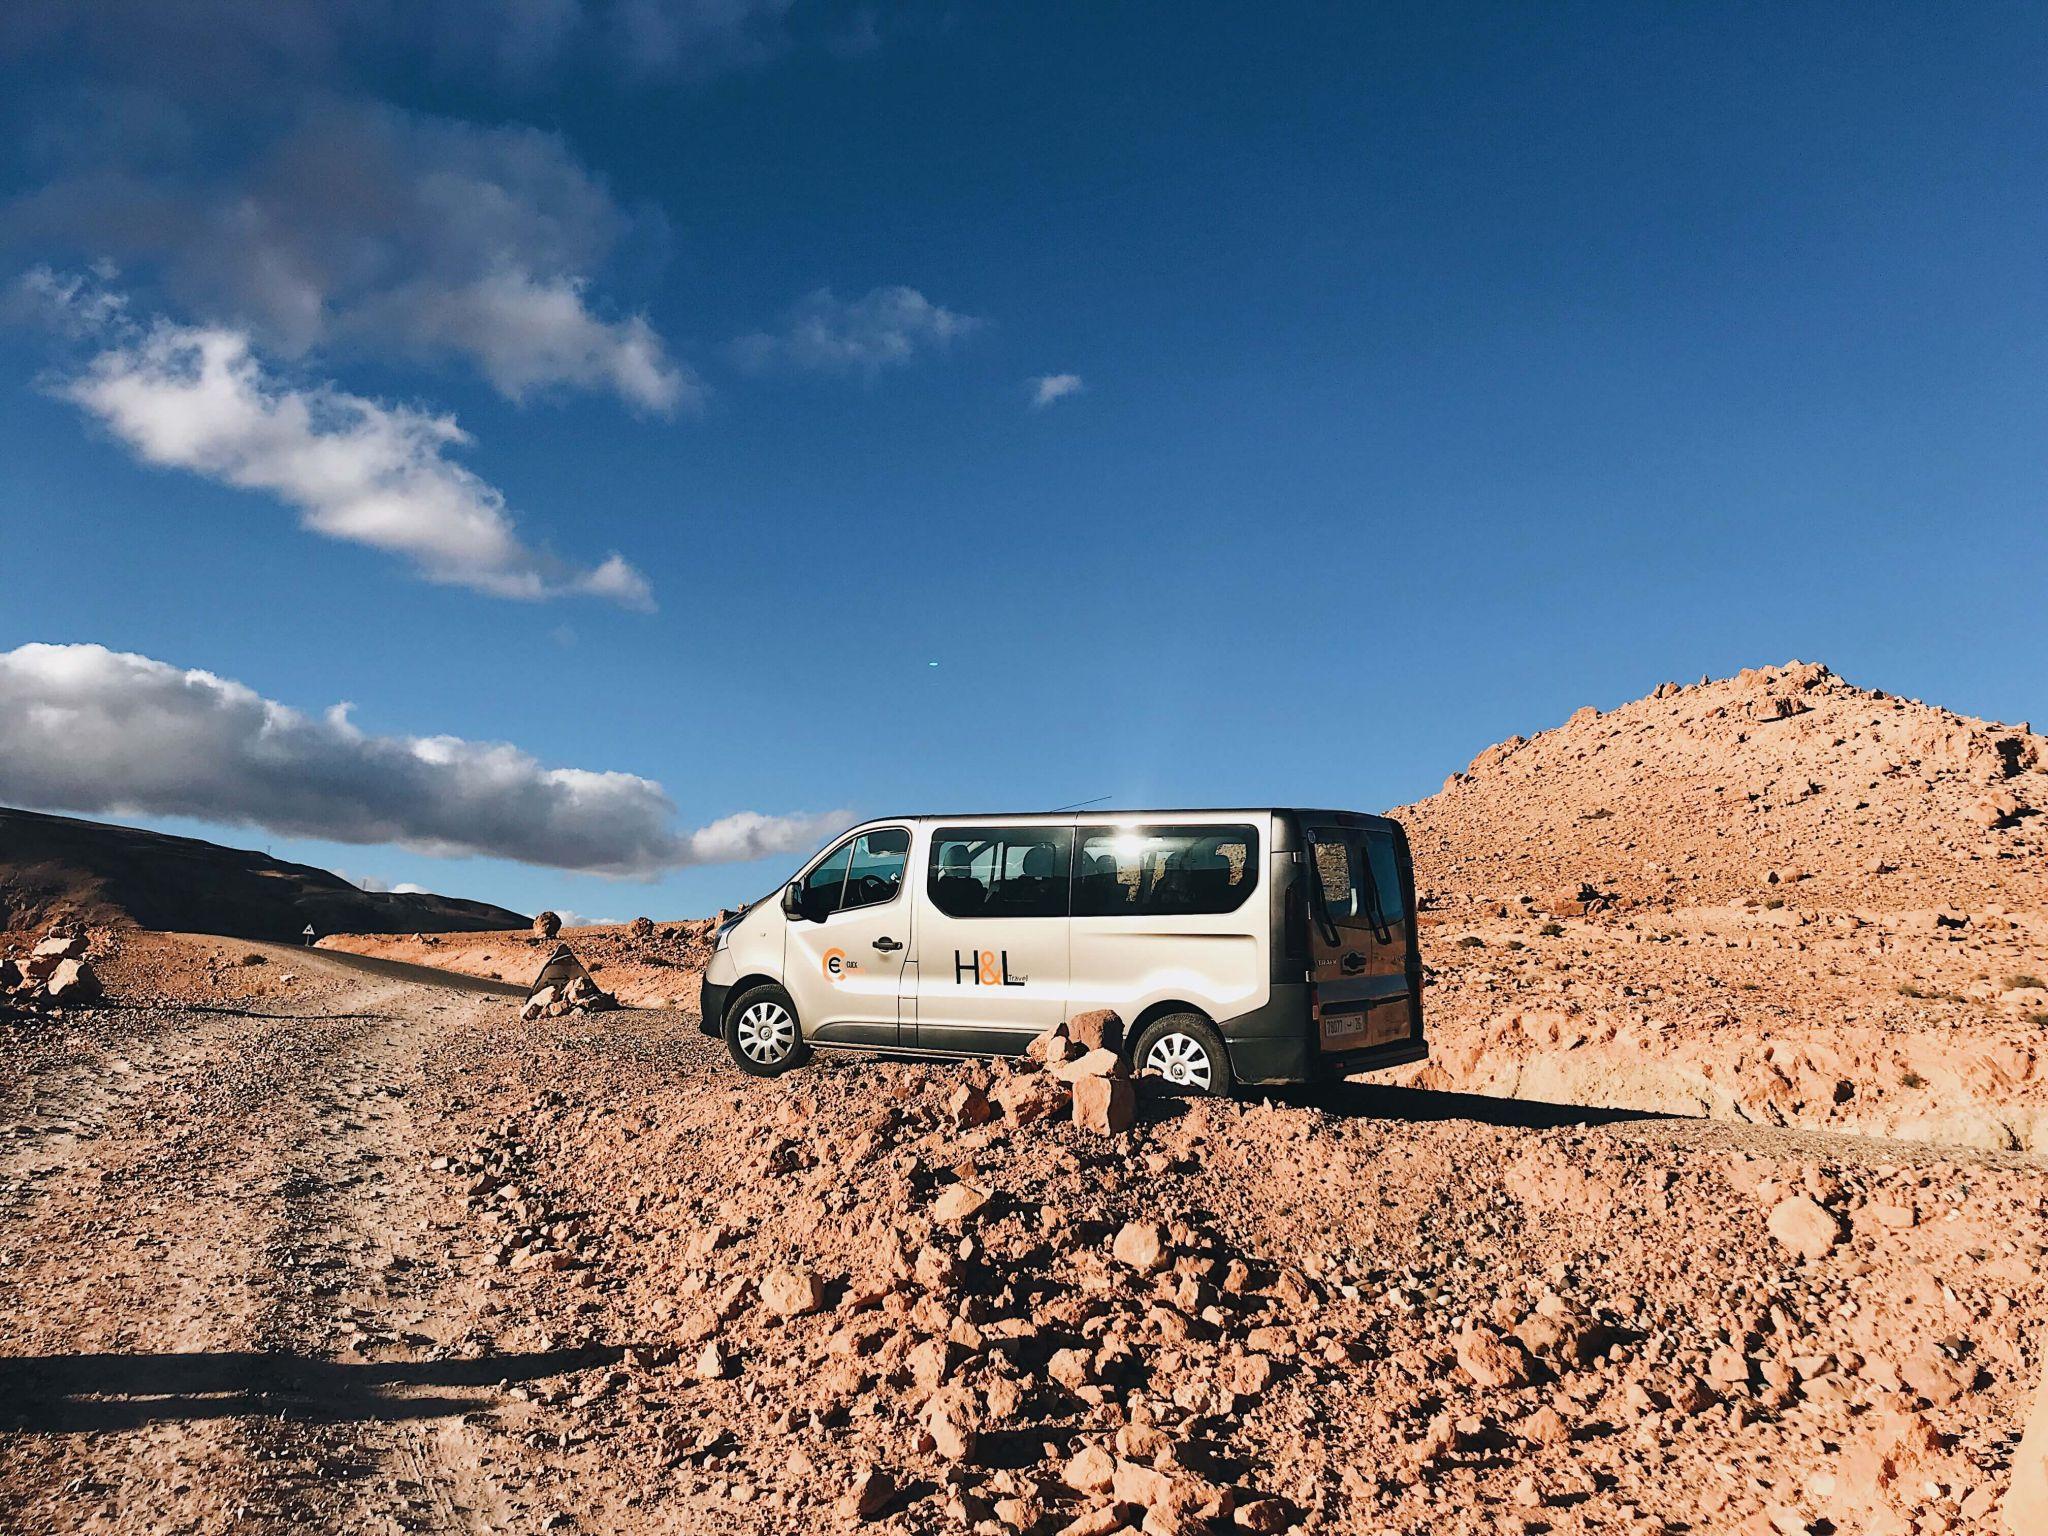 Ouarzazate Game of thrones day trip